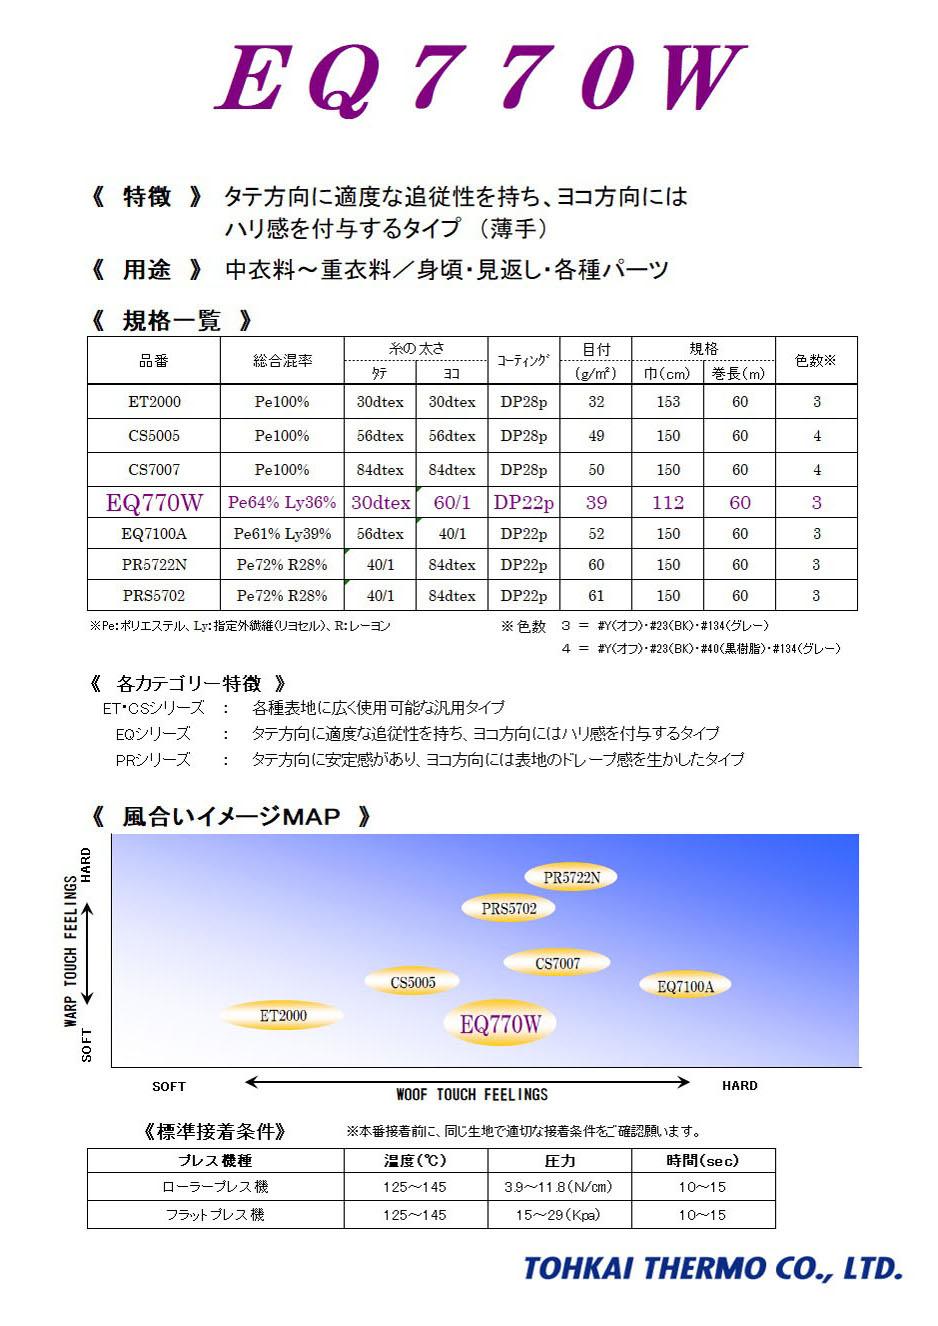 EQ770W EQシリーズ<重衣料向接着芯>[芯地] 東海サーモ(Thermo)/オークラ商事 - ApparelX アパレル資材卸通販